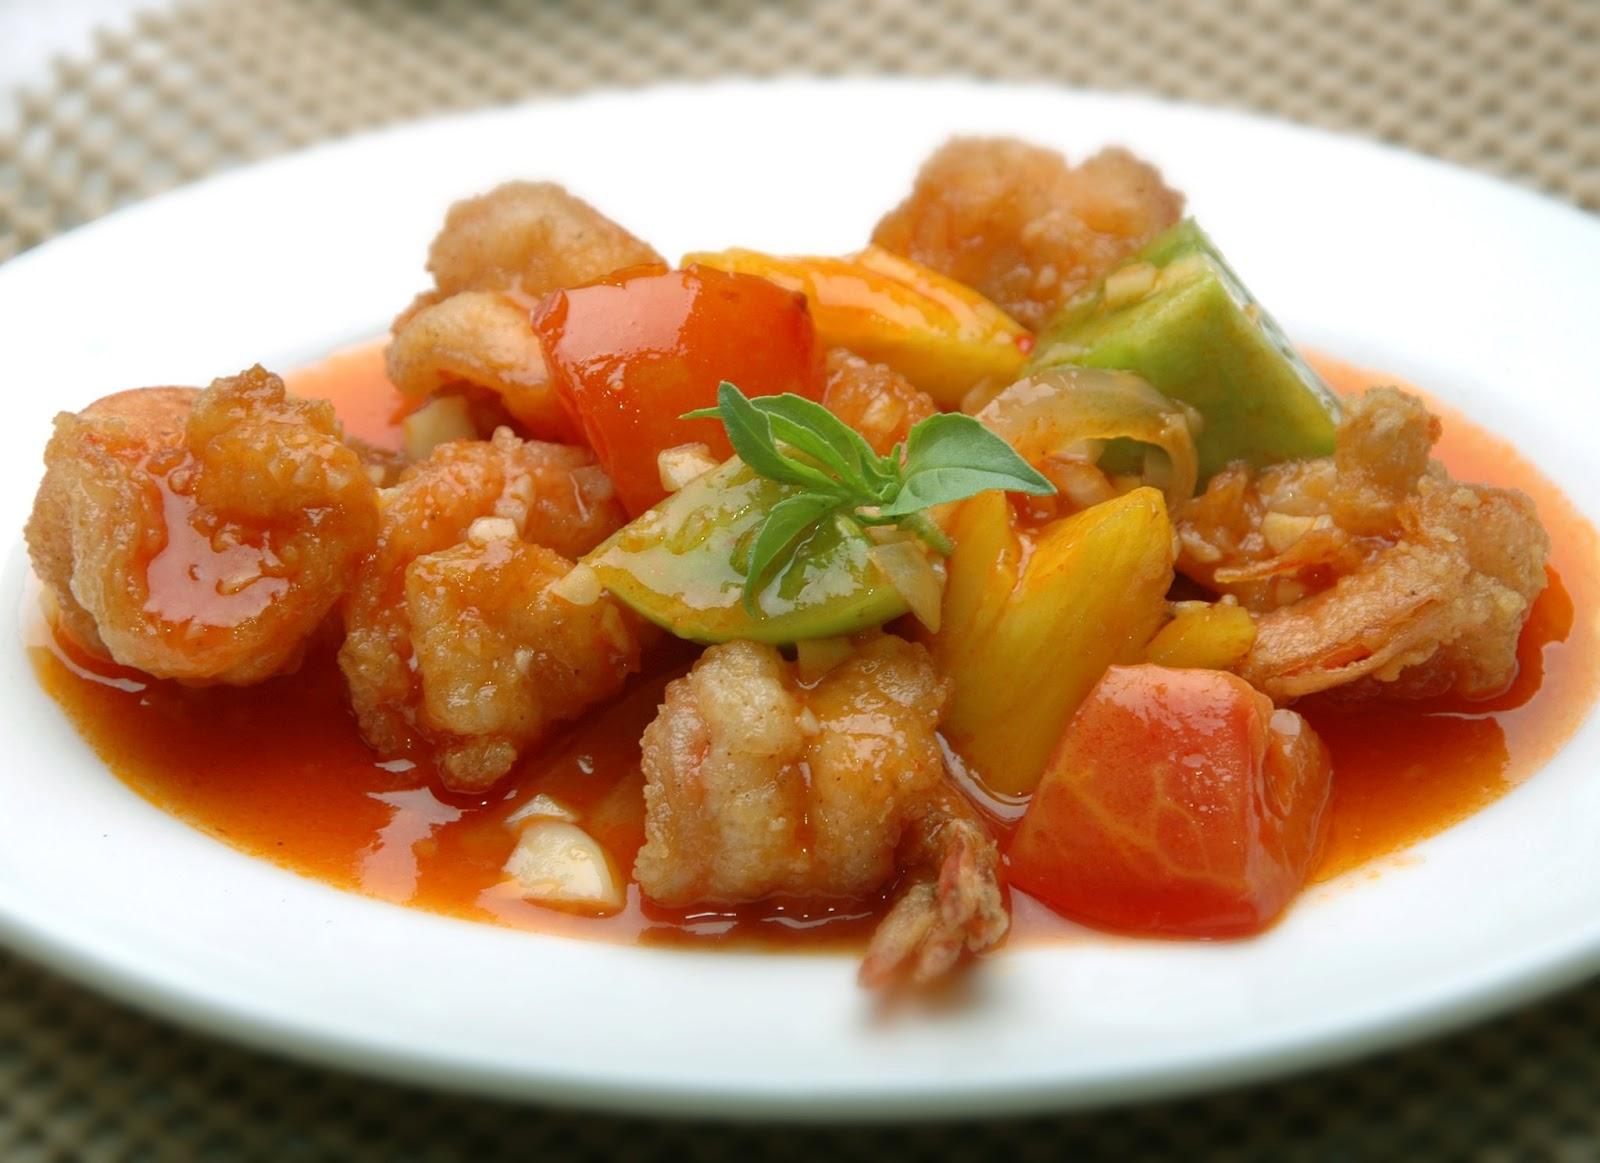 ... , Resep Masakan Bakso Ayam Udang Goreng Aneka Resep Masakan | elHouz